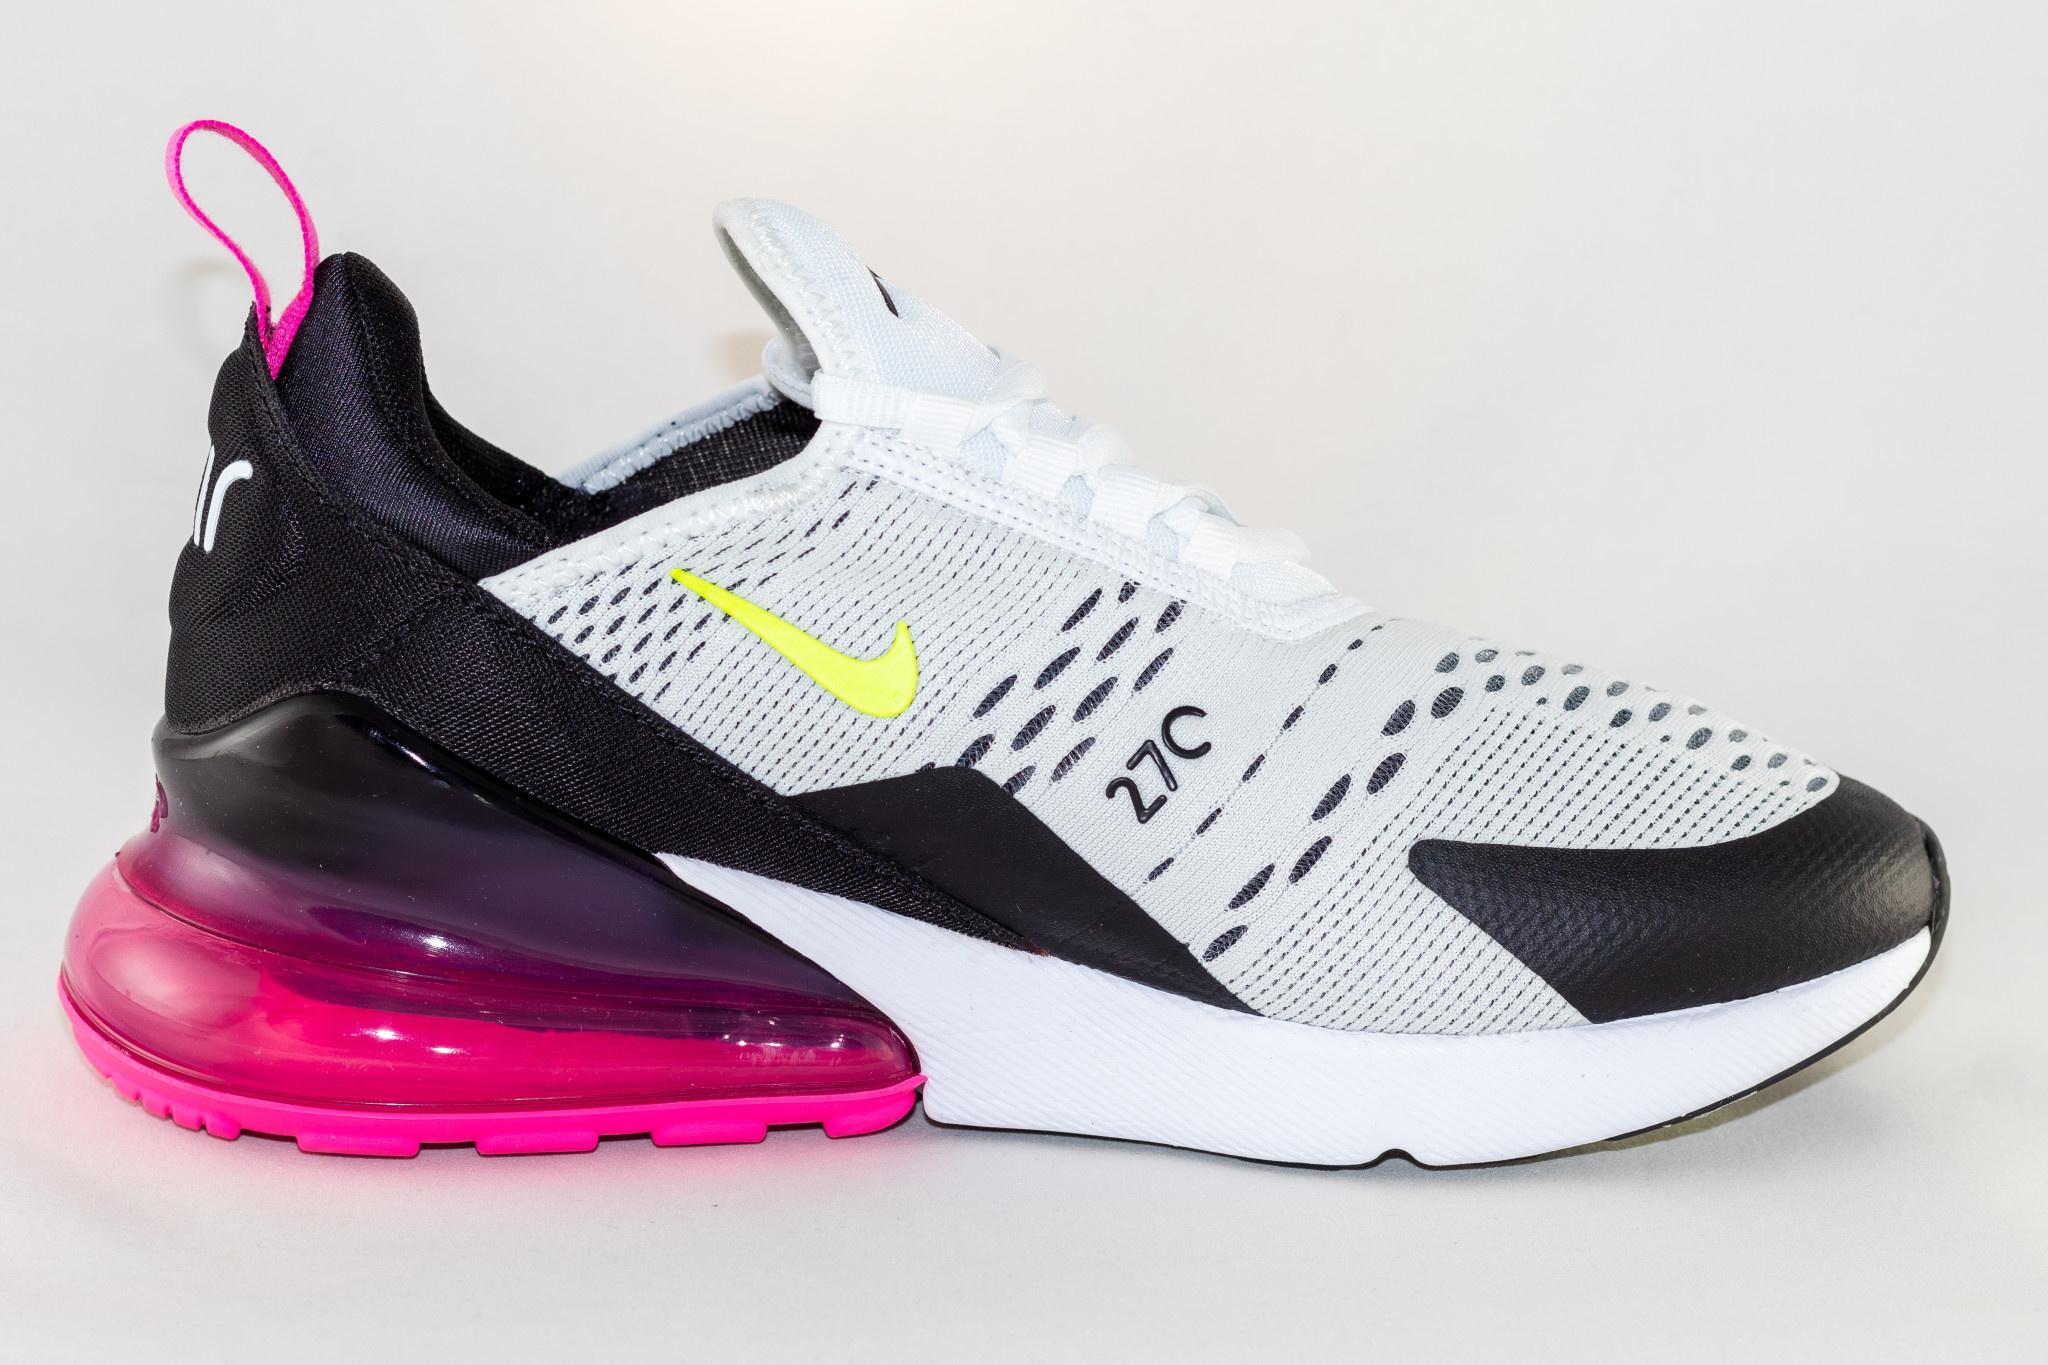 Nike J NIKE AIR MAX 270 (gs) White/ Volt-Black-Laser-Fuchsia